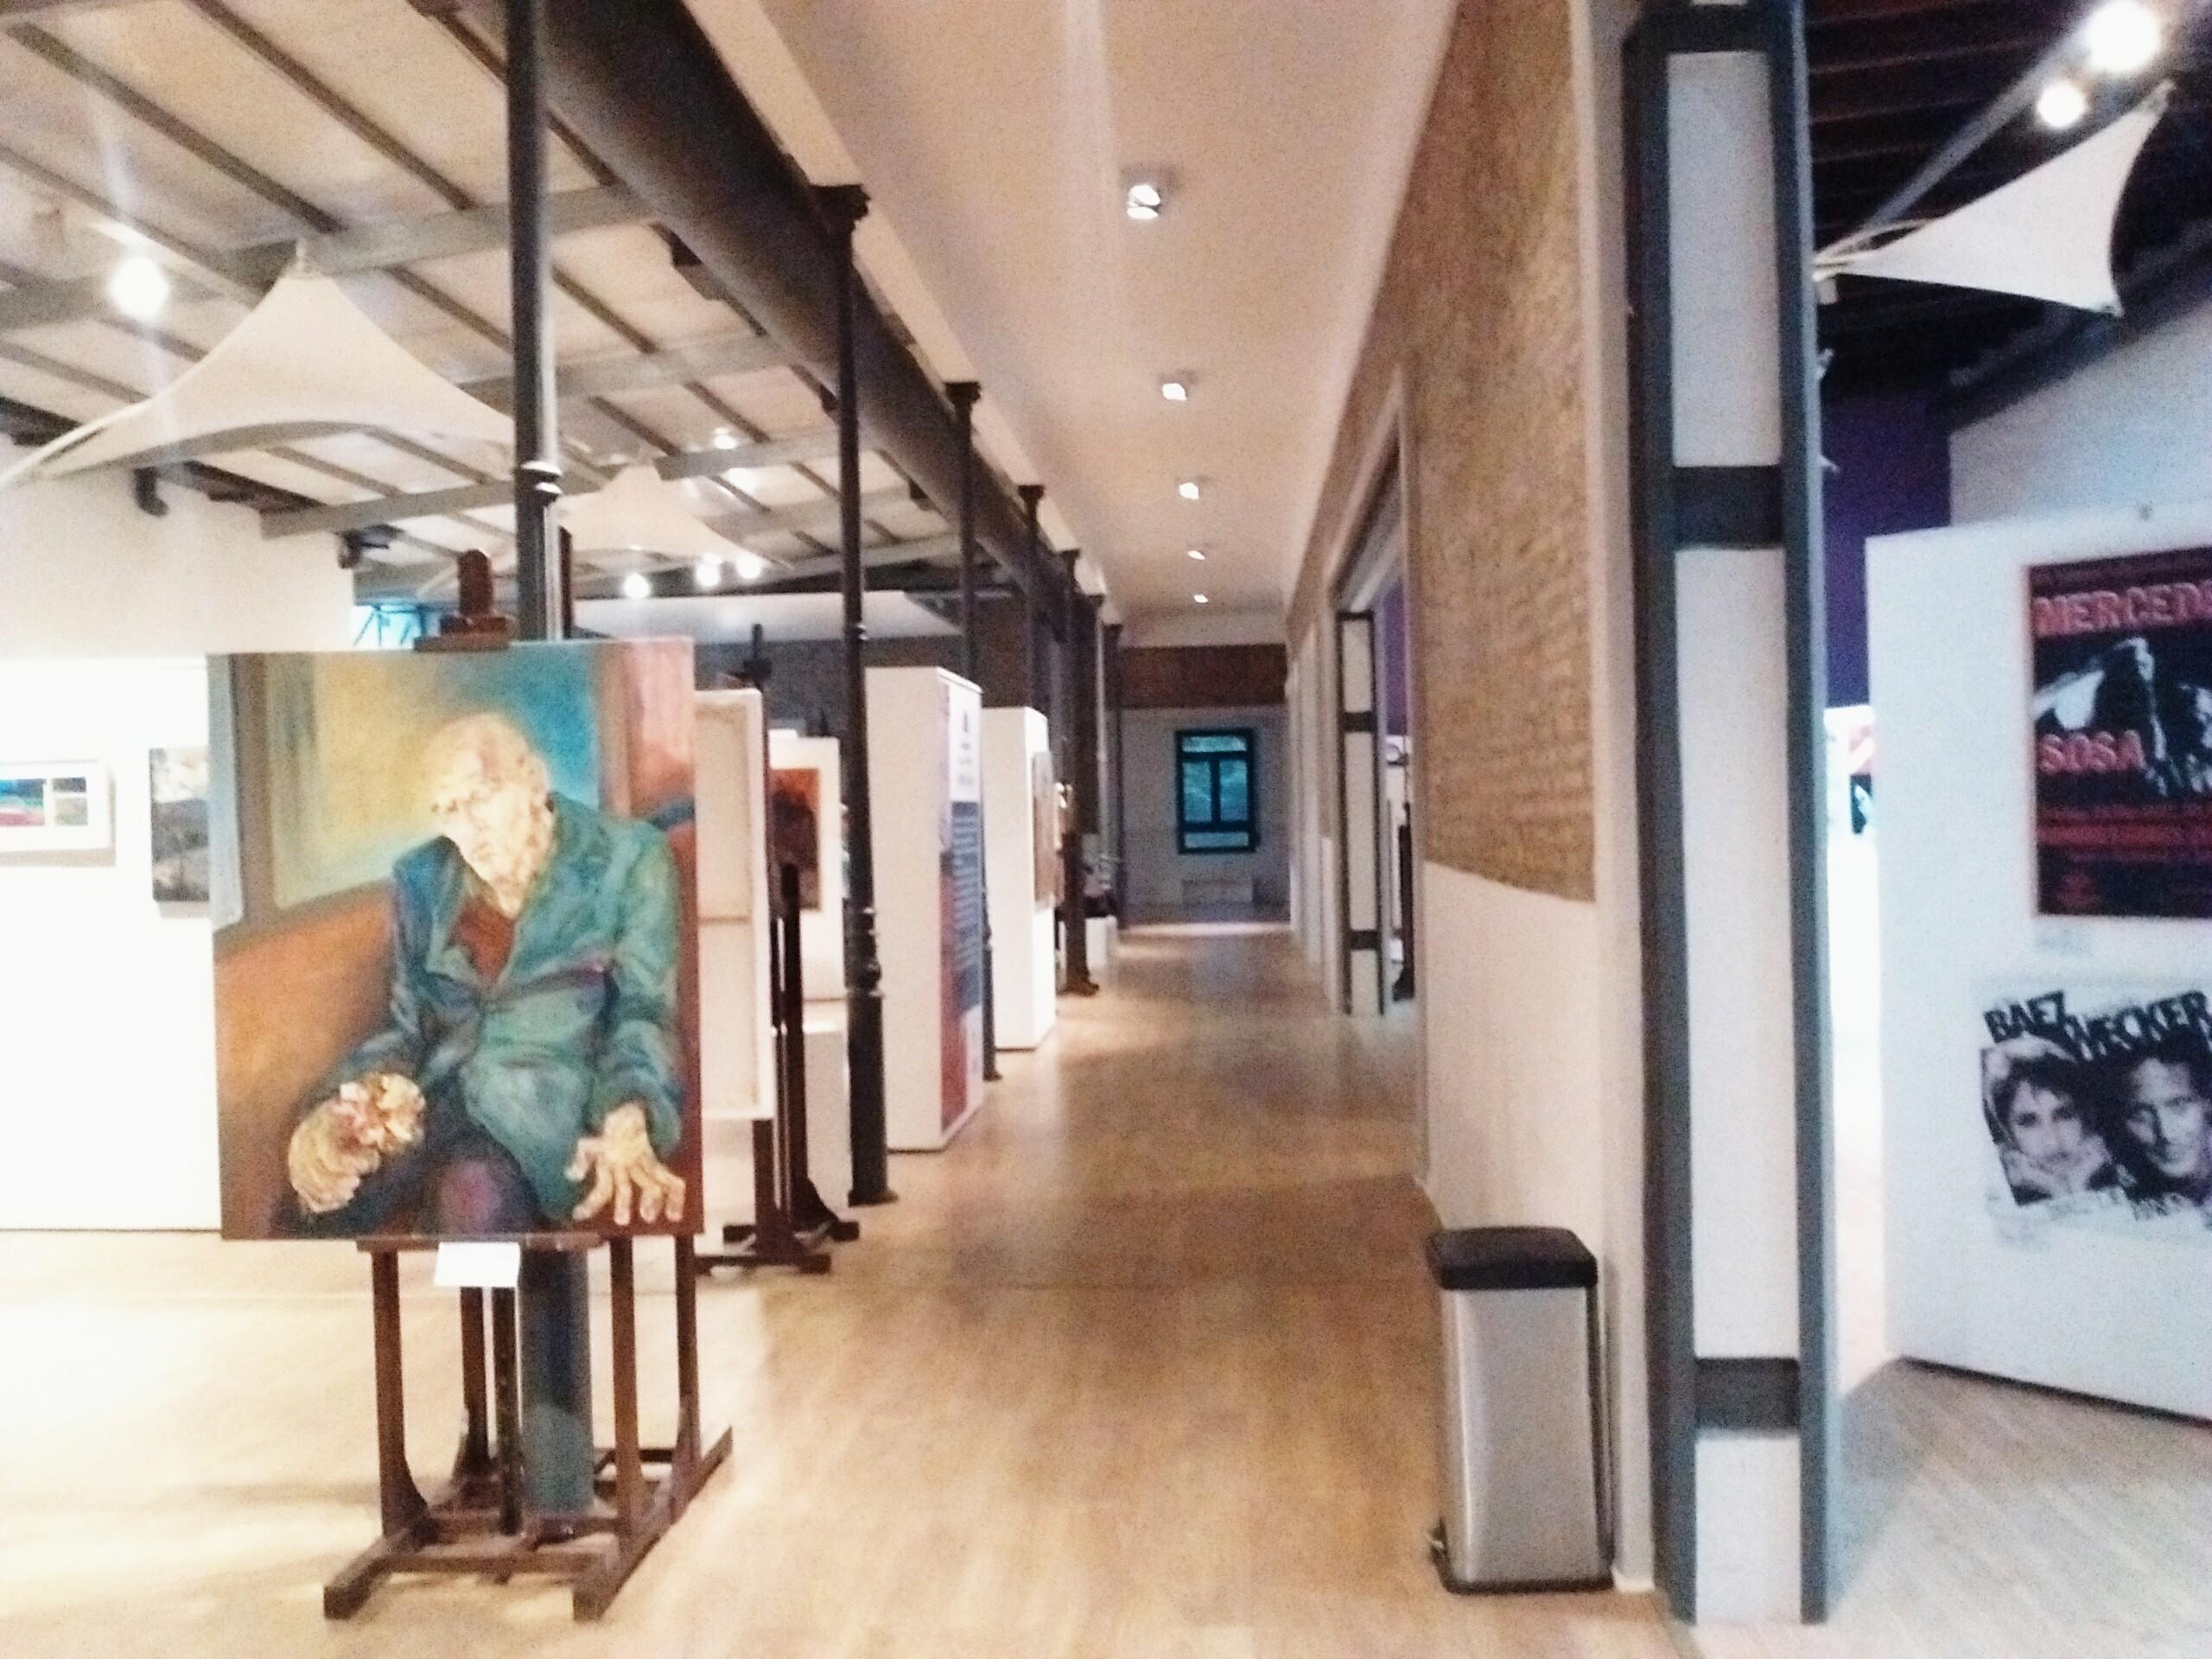 Centro municipal de arte de Avellaneda Sala de exhibición - Sala de Exhibición de Artes Visuales del Centro Municipal de Arte de Avellaneda